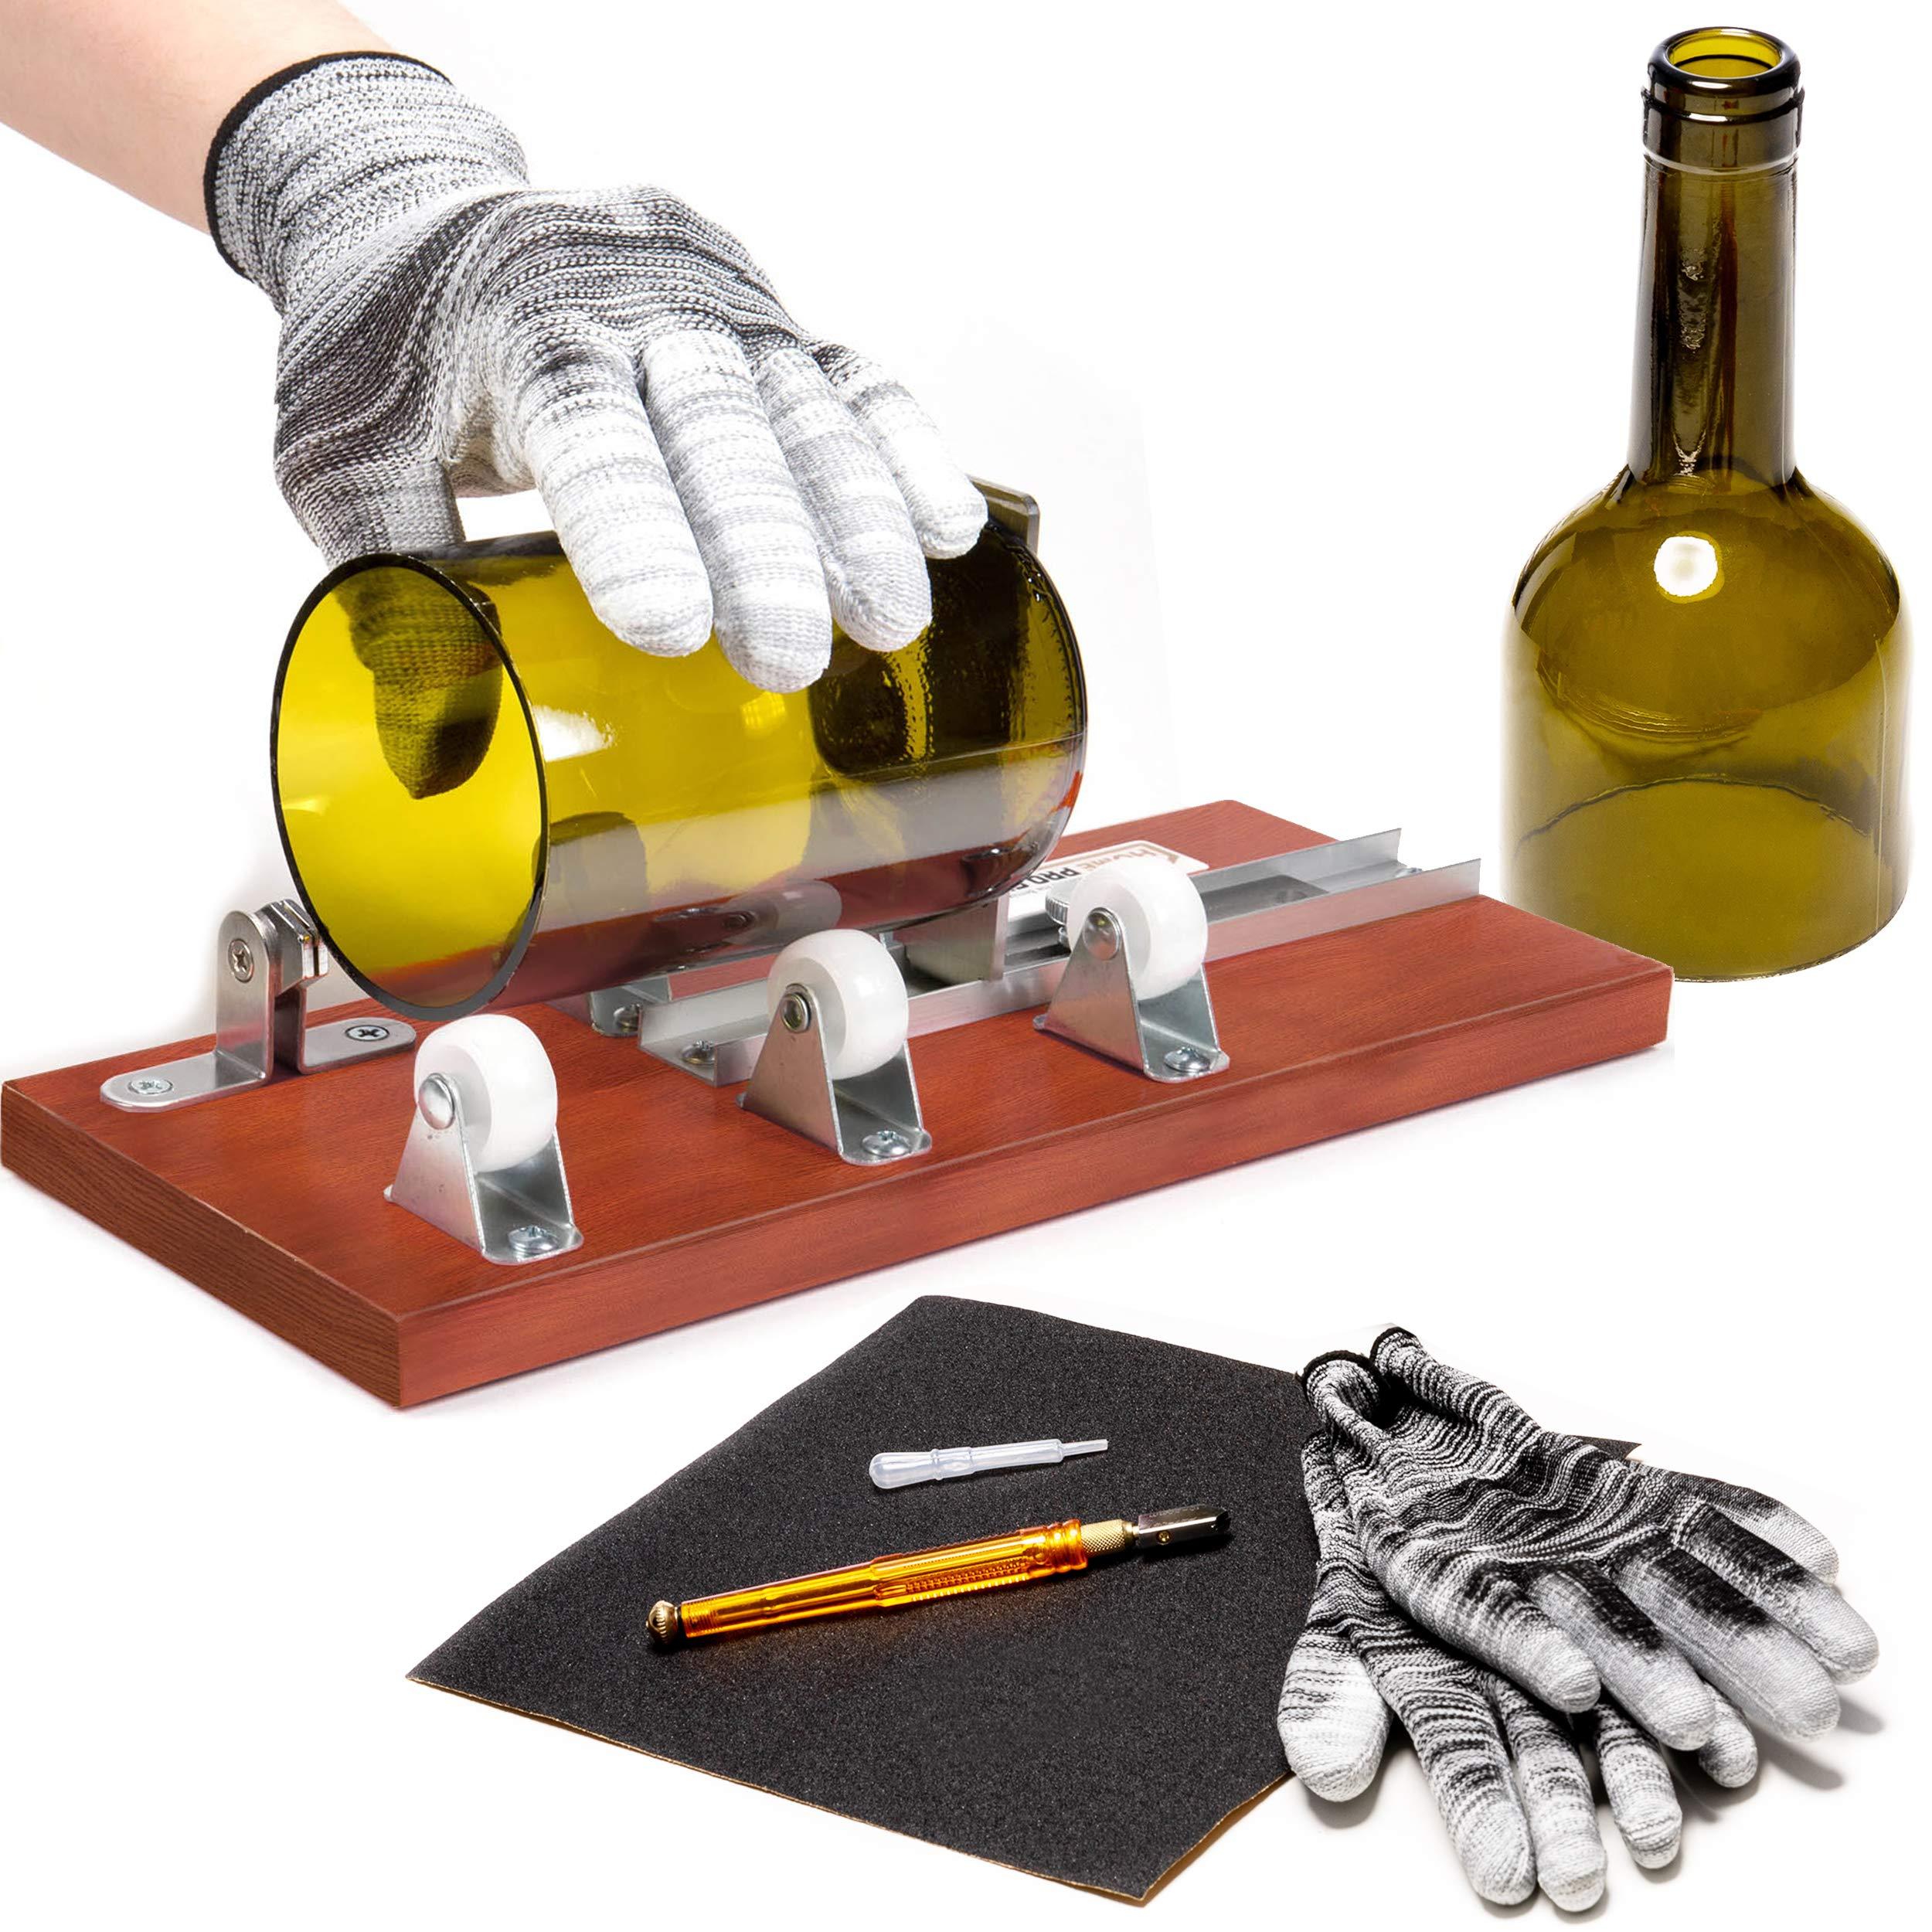 HPST Bottle Cutter & Glass Cutter Bundle - DIY Glass Bottle Cutter for Professional Use for Cutting Wine, Beer or Soda Round Bottles & Mason Jars